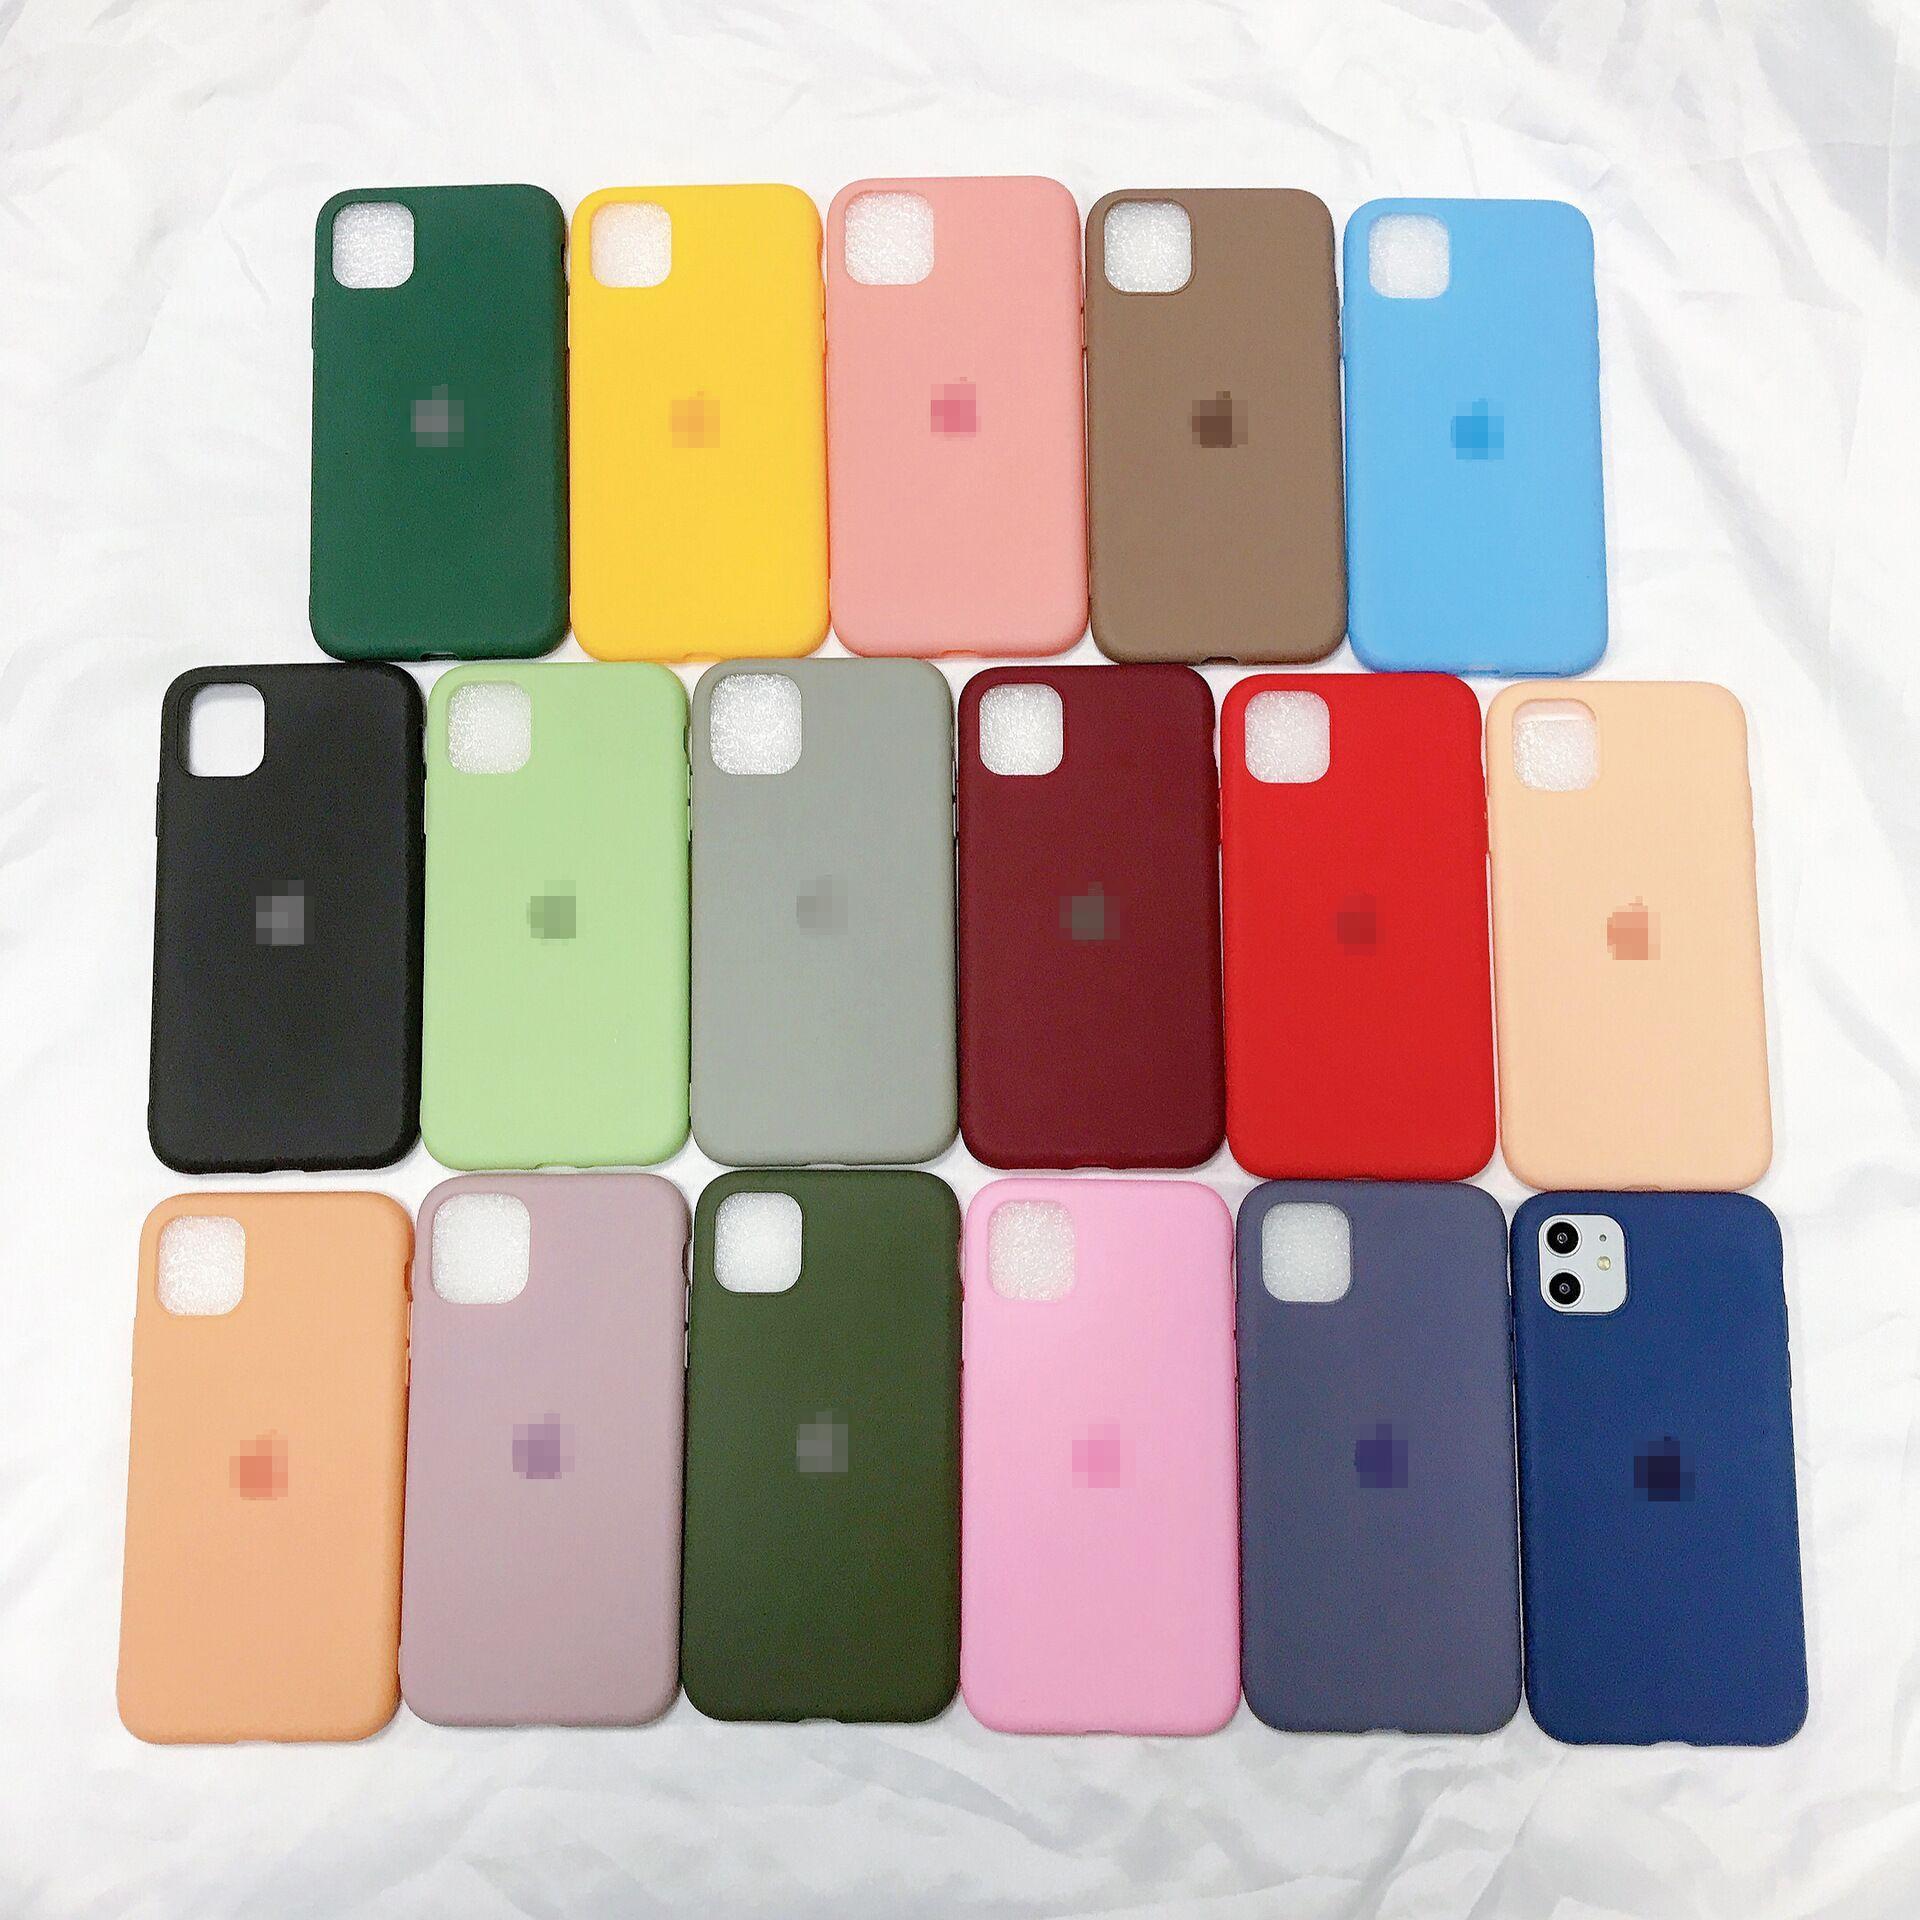 iPhone 11 Pro Max XS Max XR 8 7 6 6s 플러스 DHL 무료 배송을위한 로고 원래 액체 실리콘 케이스가 있습니다.